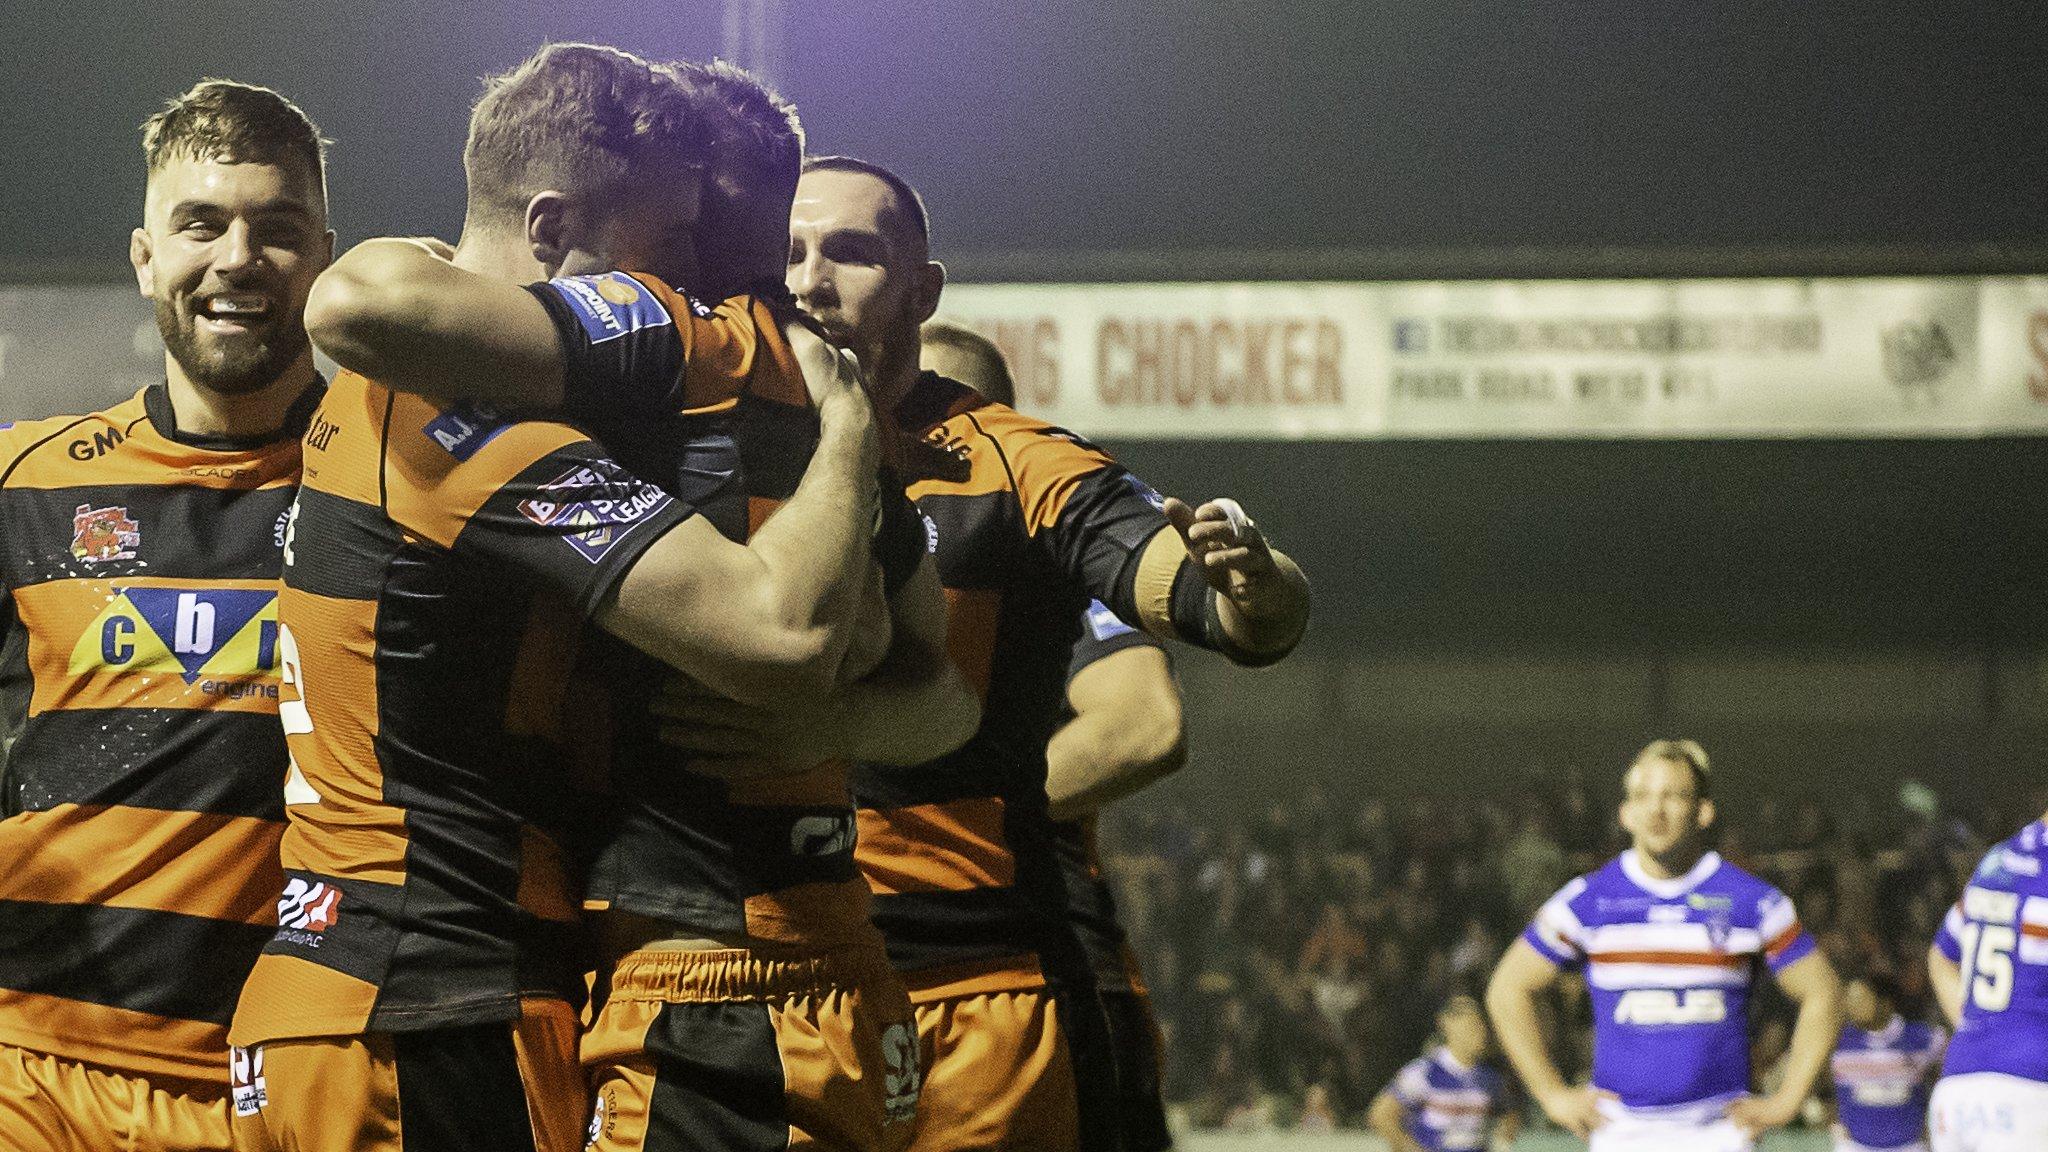 Super League: Castleford Tigers 28-16 Wakefield Trinity